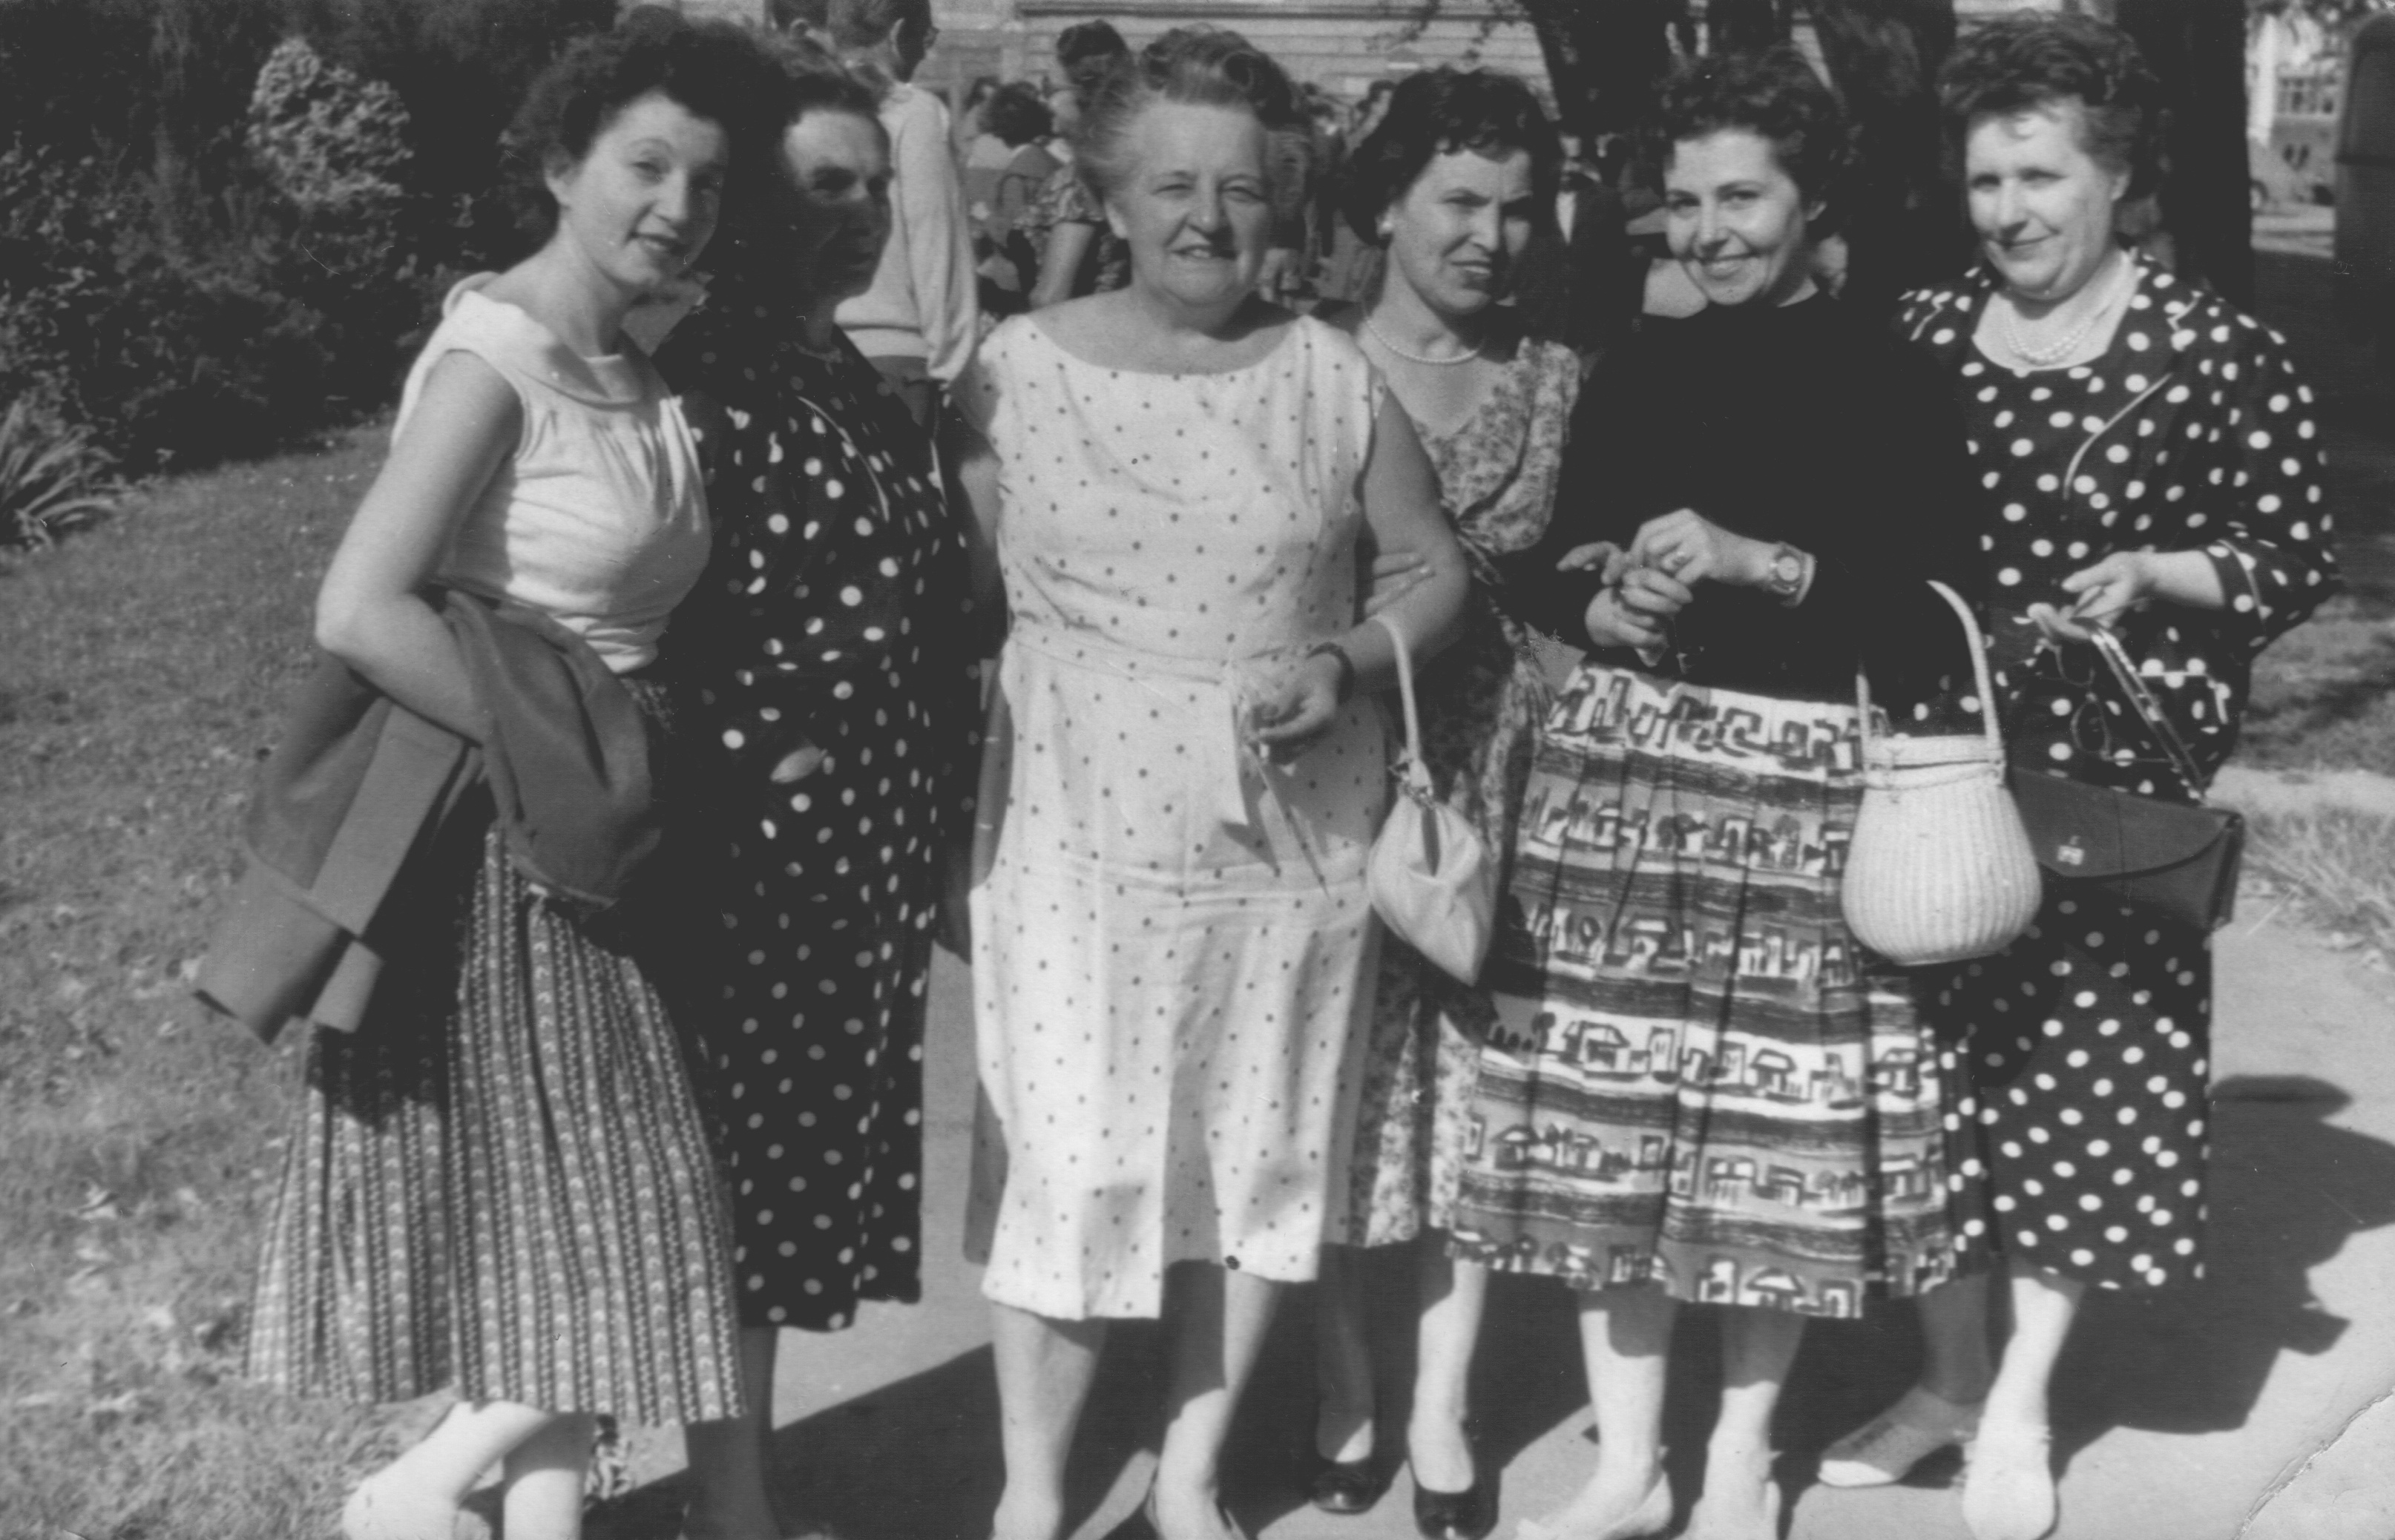 1960_08_17_papi_maria_textiljatek_pozsony1960viii17igazan.JPG